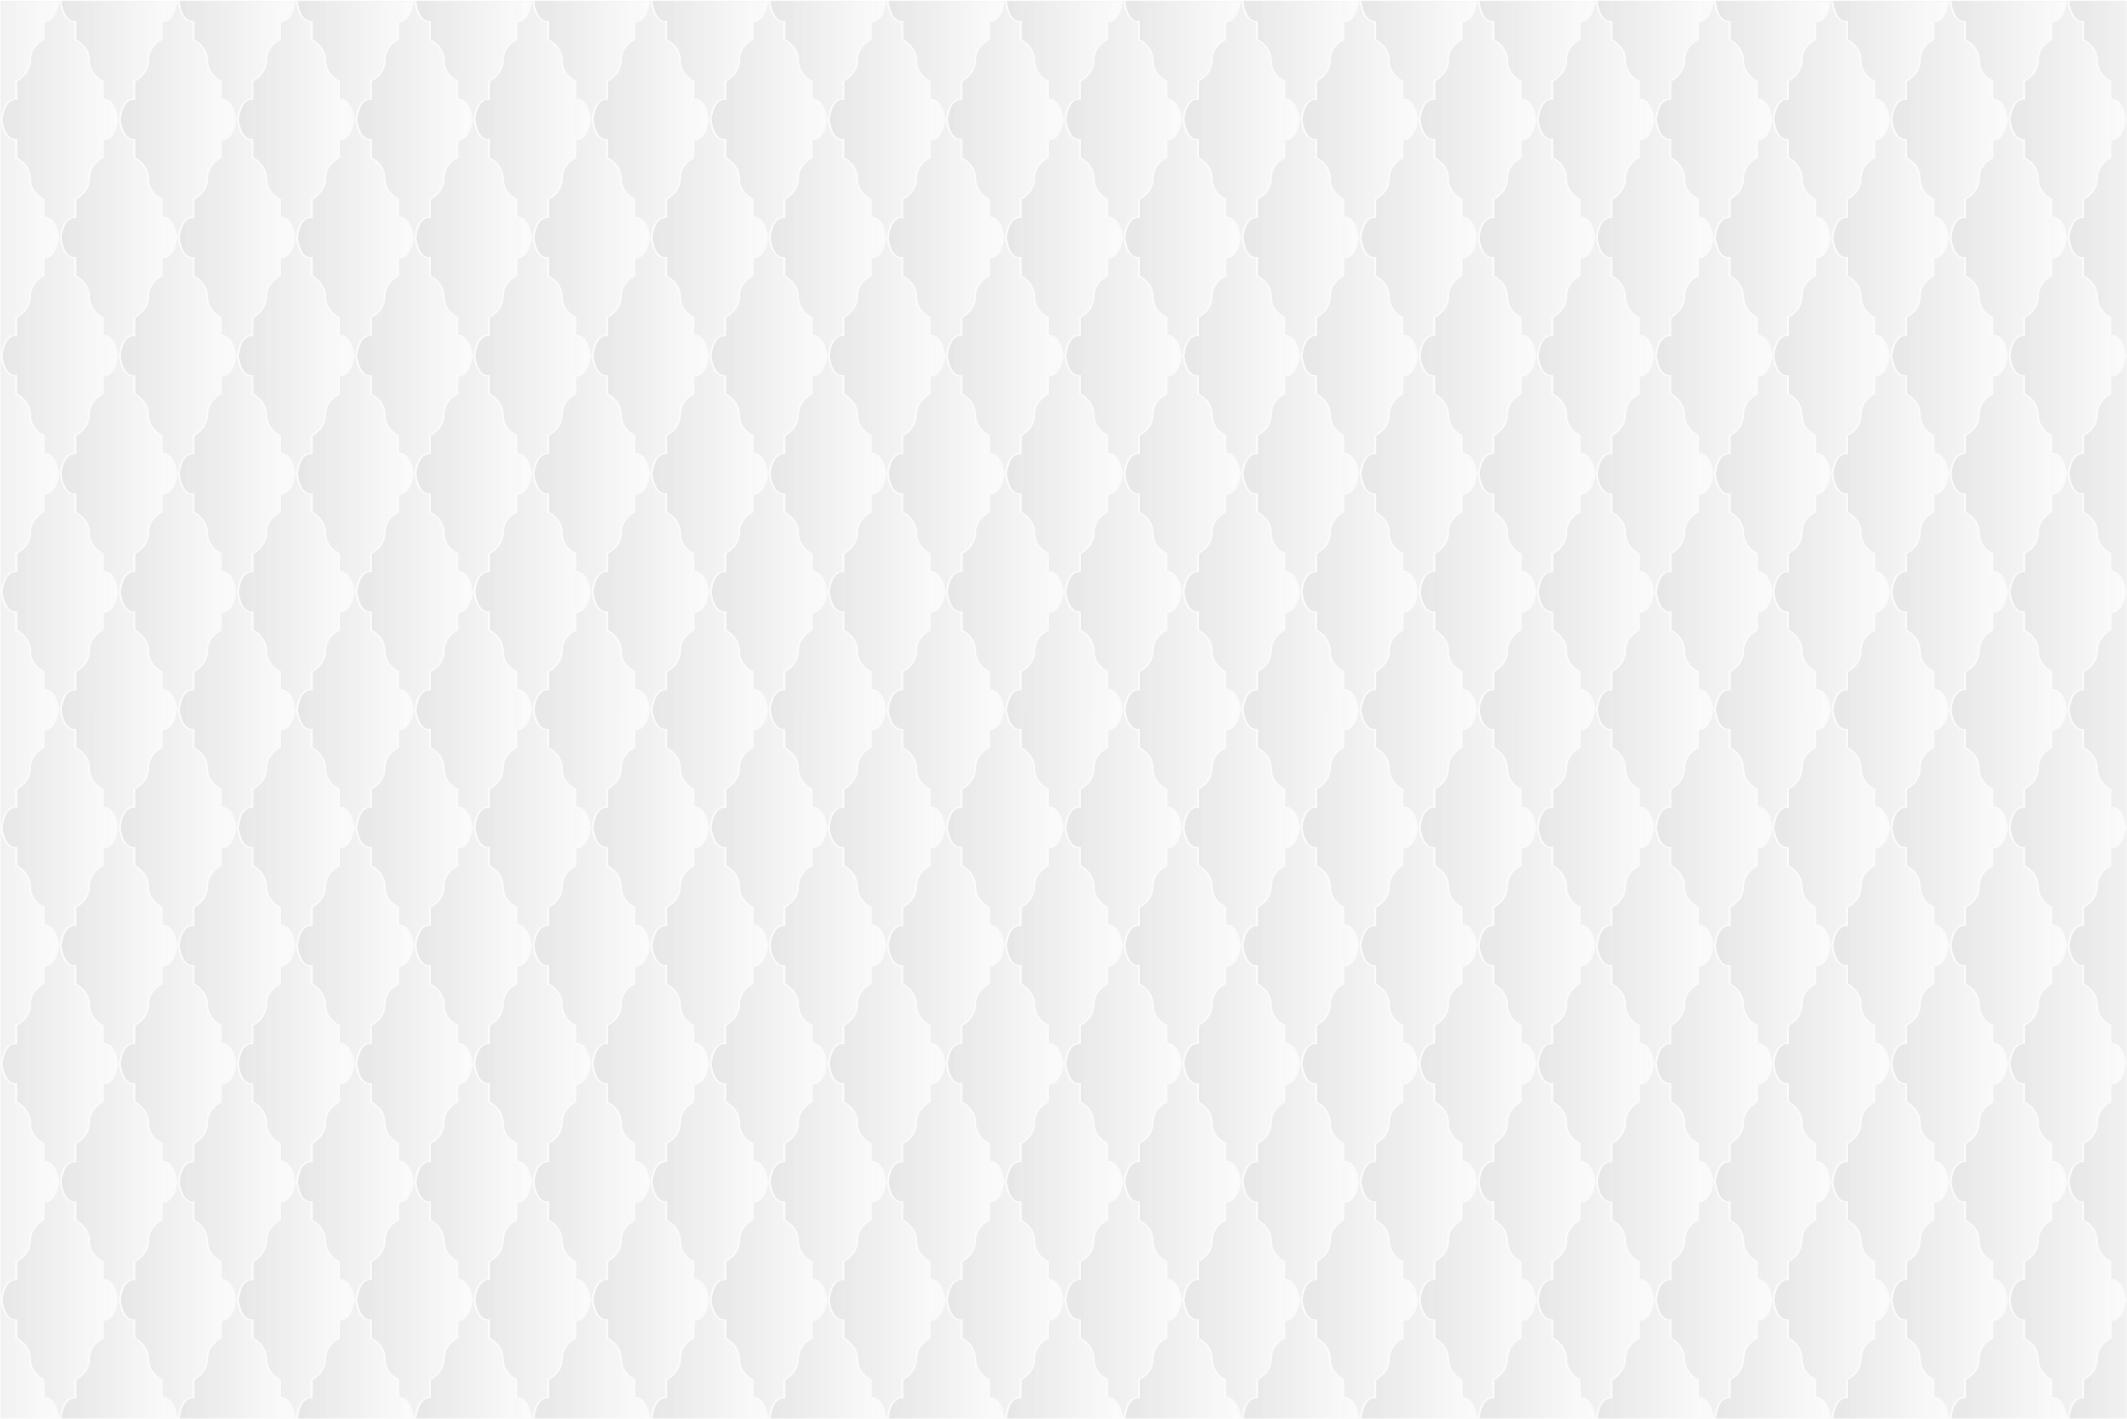 Decorative white soft textures set example image 7